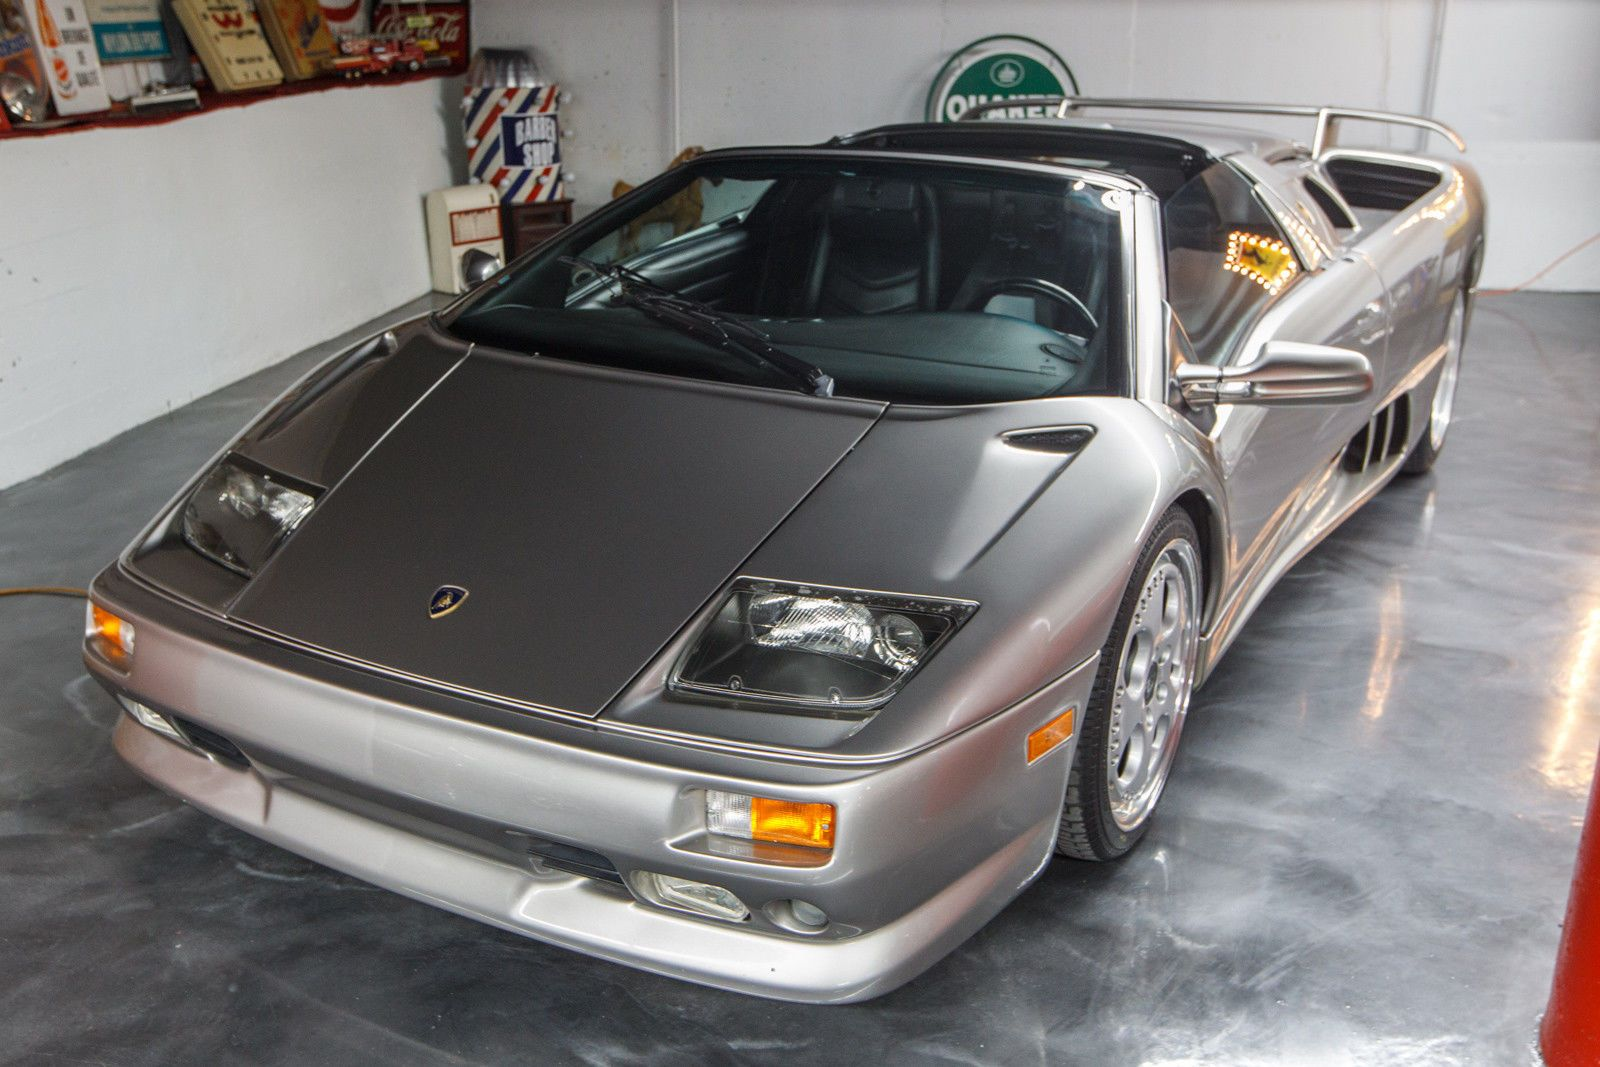 Lamborghini Diablo Roadster Vt 1999 Lamborghini Diablo Vt Roadster